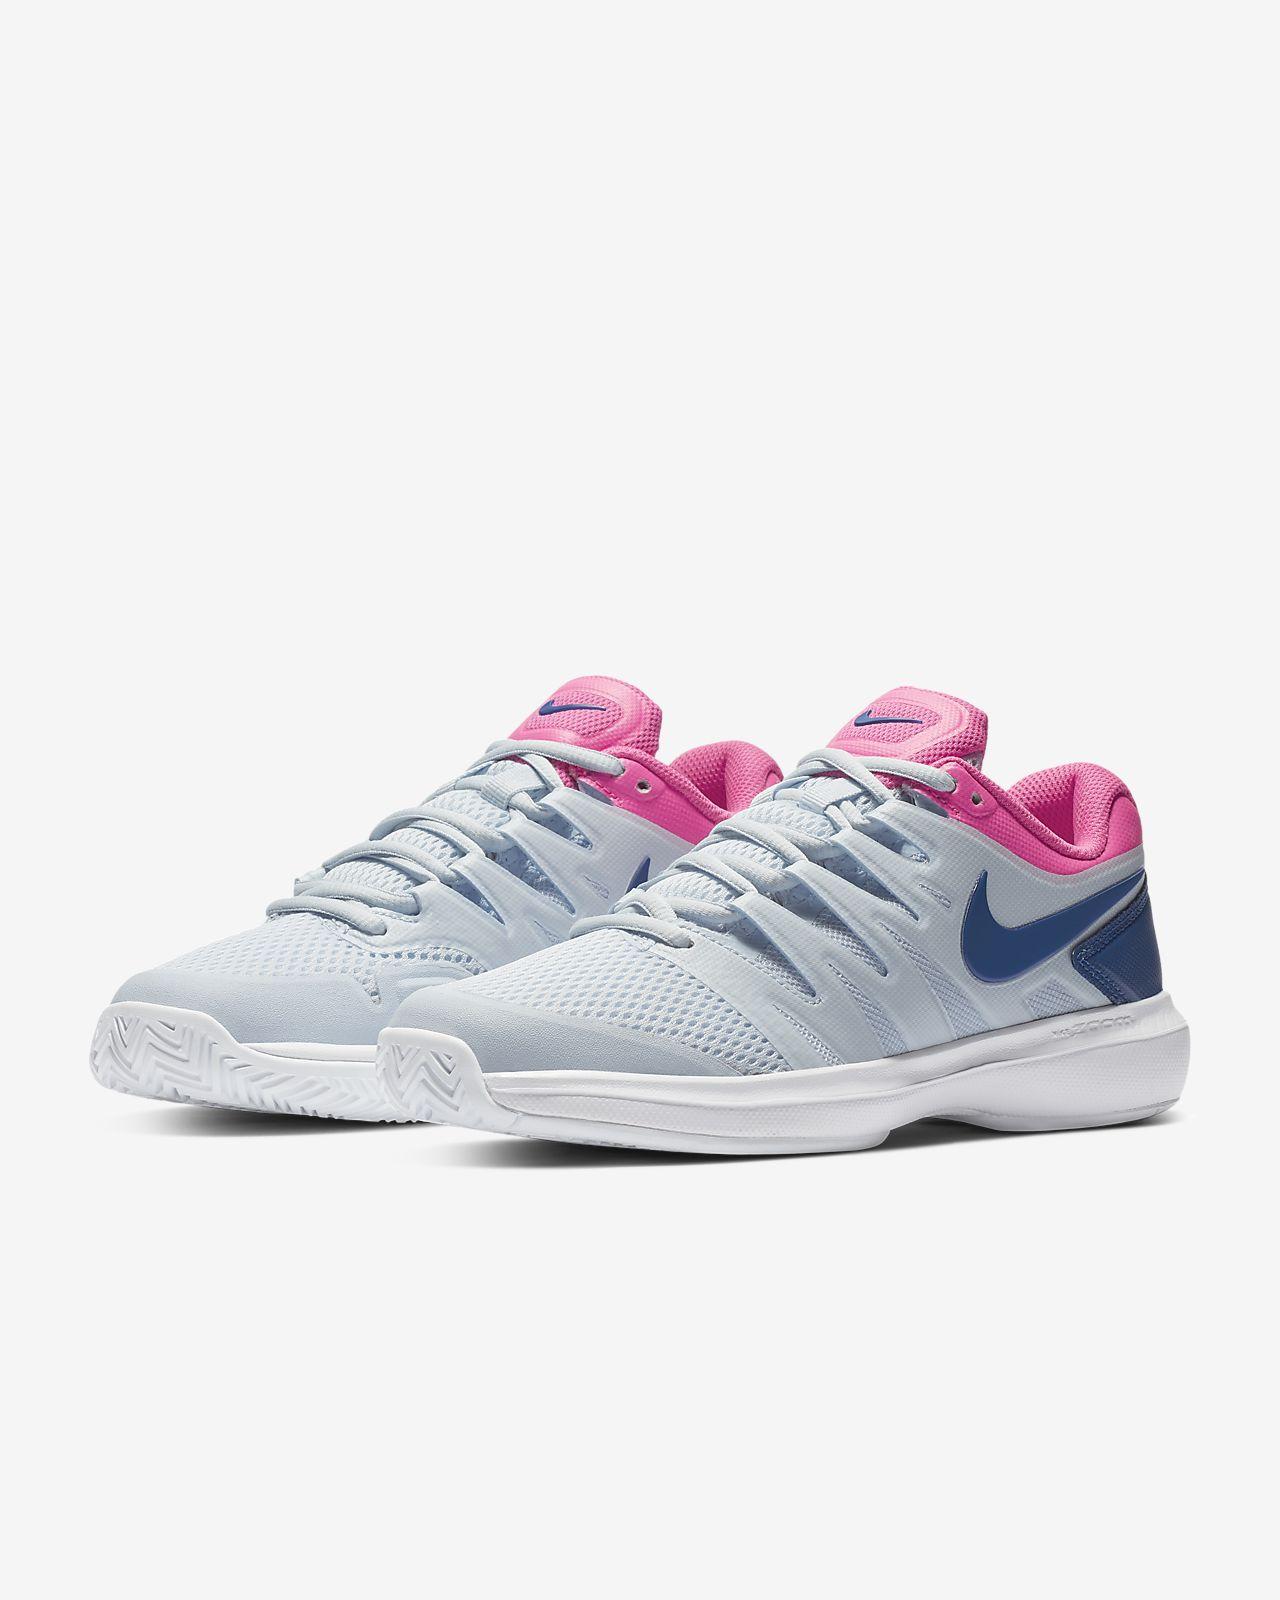 7c47686bfdf6 NikeCourt Air Zoom Prestige Women s Hard Court Tennis Shoe. Nike.com AU